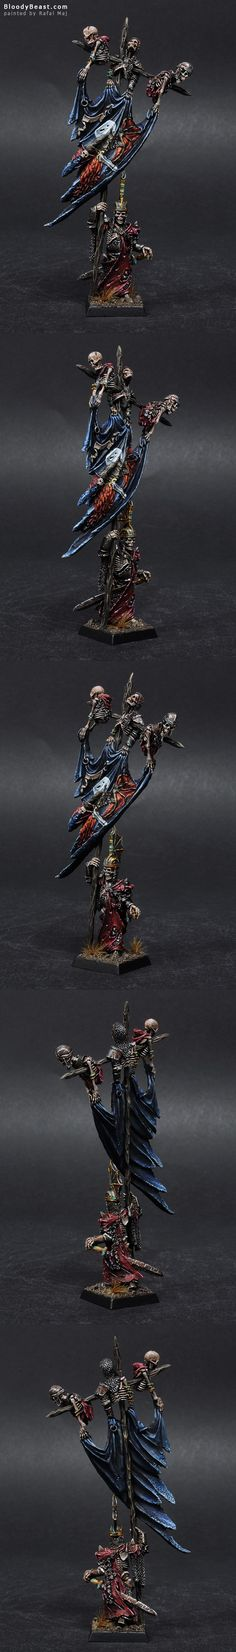 Vampire Counts Wight King Battle Standard Bearer